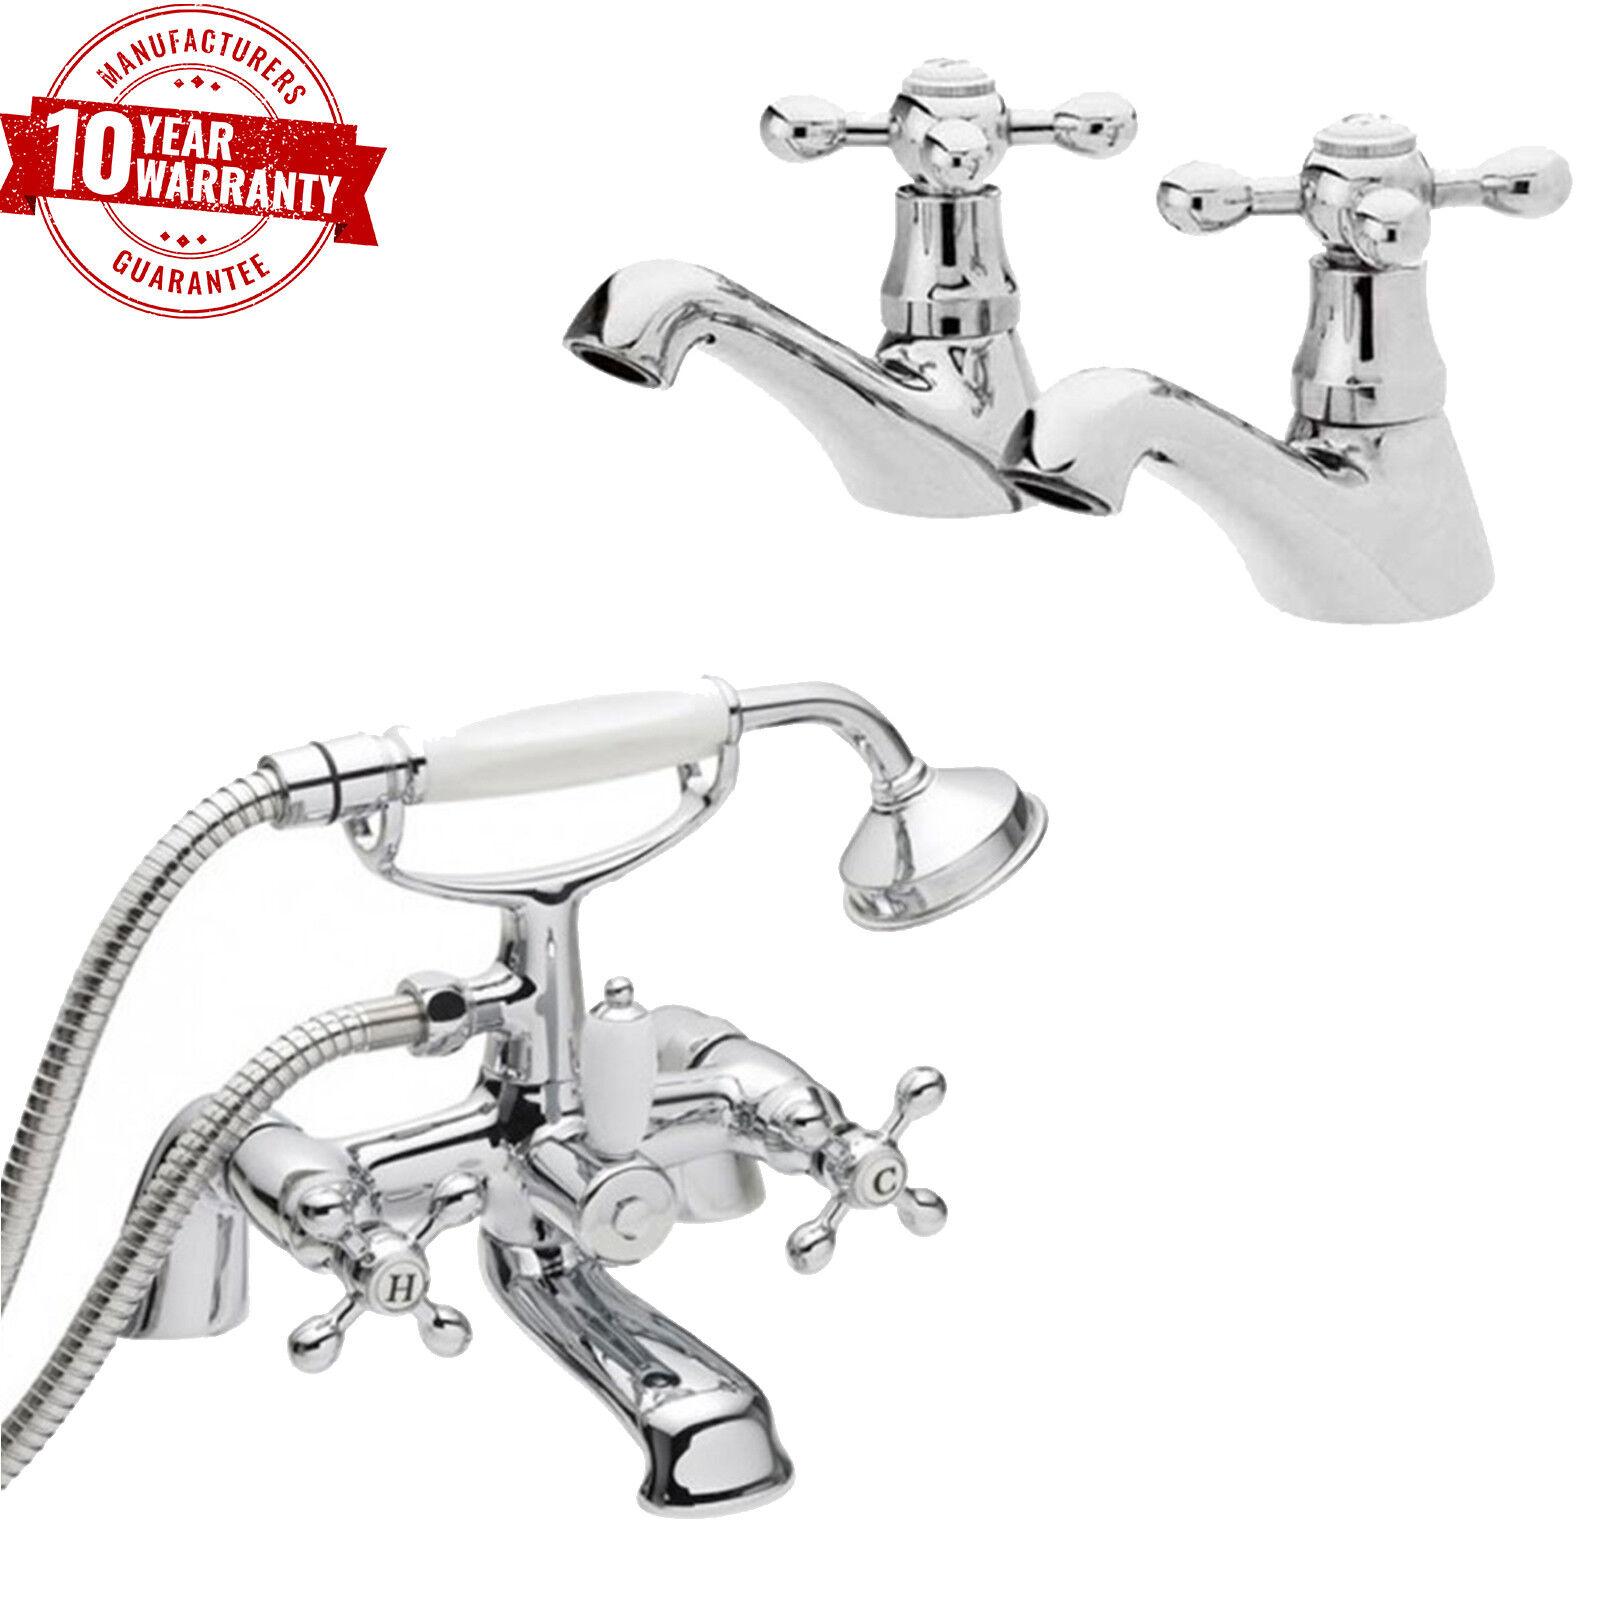 Tradizionali rubinetti lavabo cromo PAIR & Bagno Doccia Miscelatore TRAVERSA Maniglie Set  V